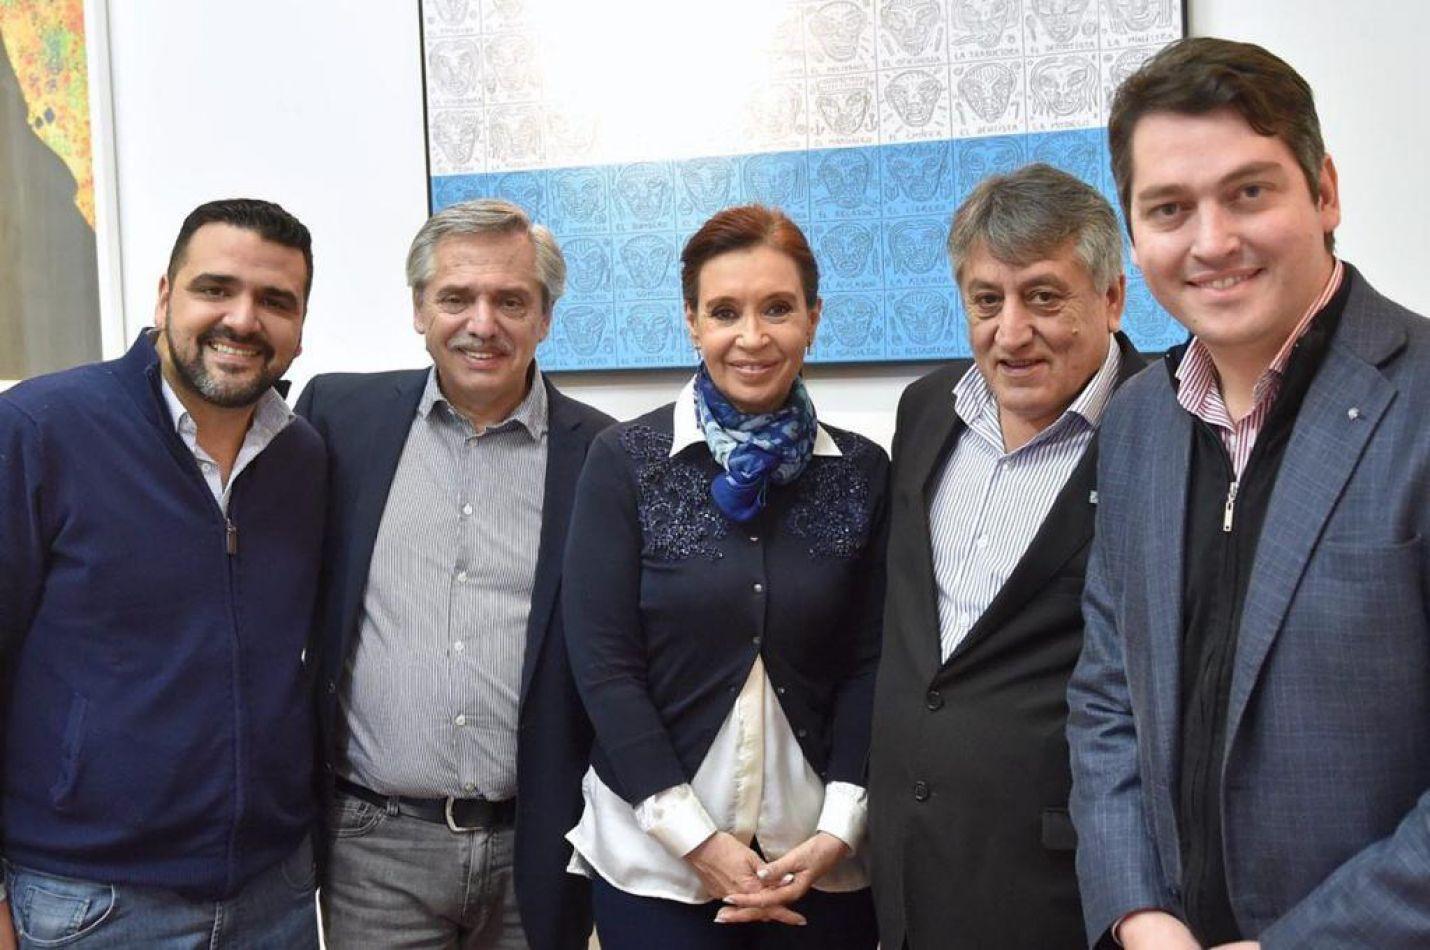 Seis candidatos se disputan la intendencia de Tolhuin